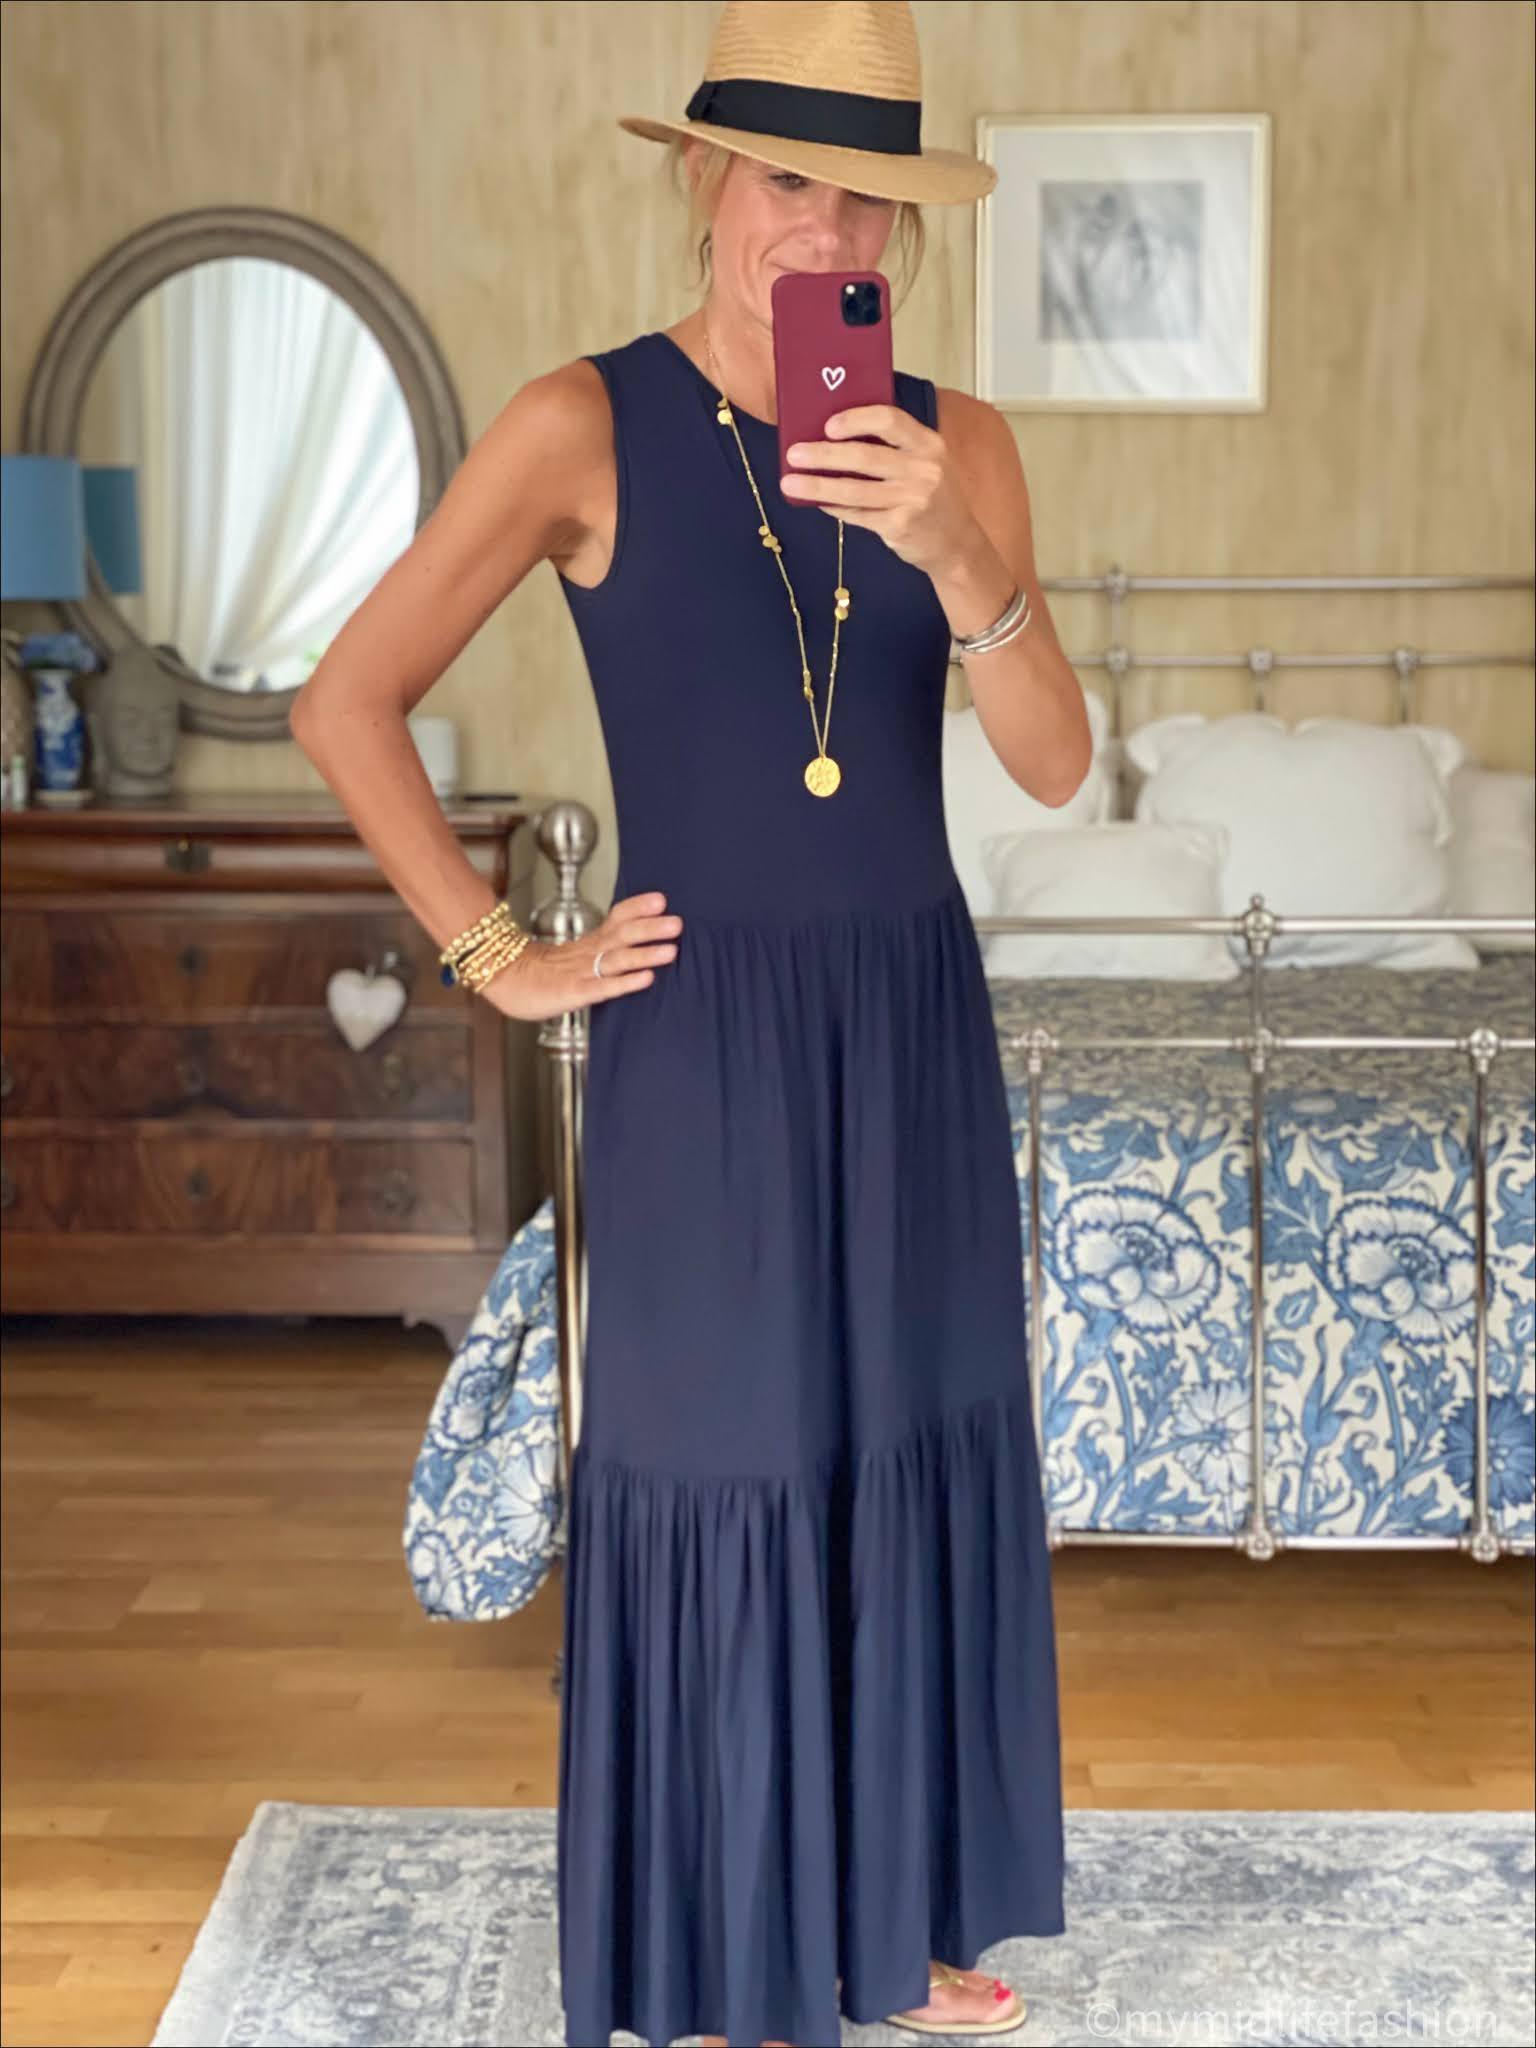 my midlife fashion, saint and Sofia greenwich dress, h and m straw Panama hat, havaianas slim fit metallic gold flip flops